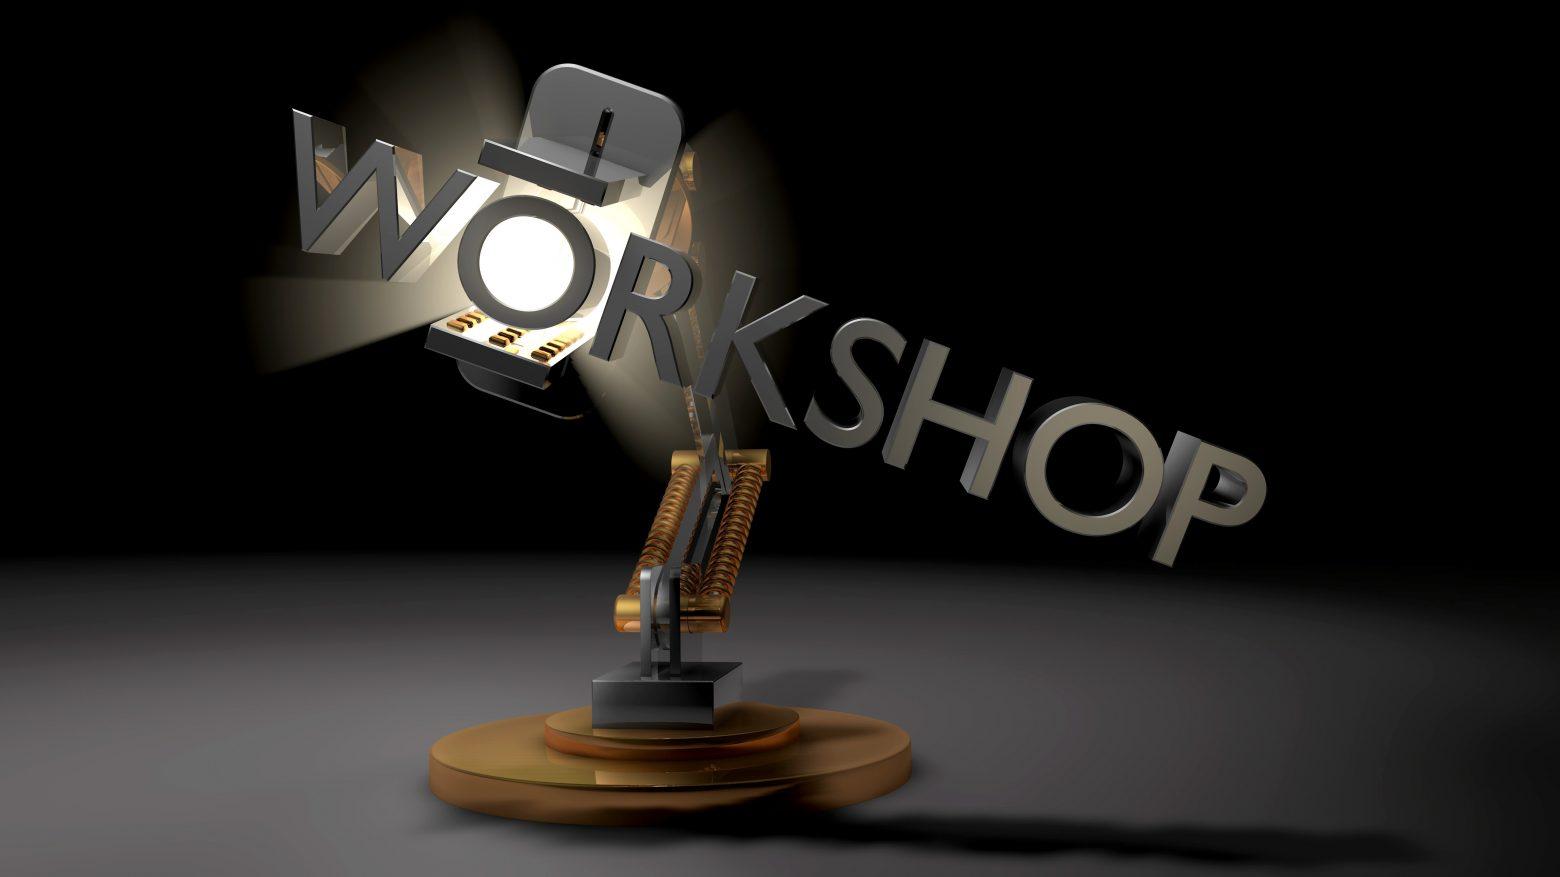 workshop-1654622